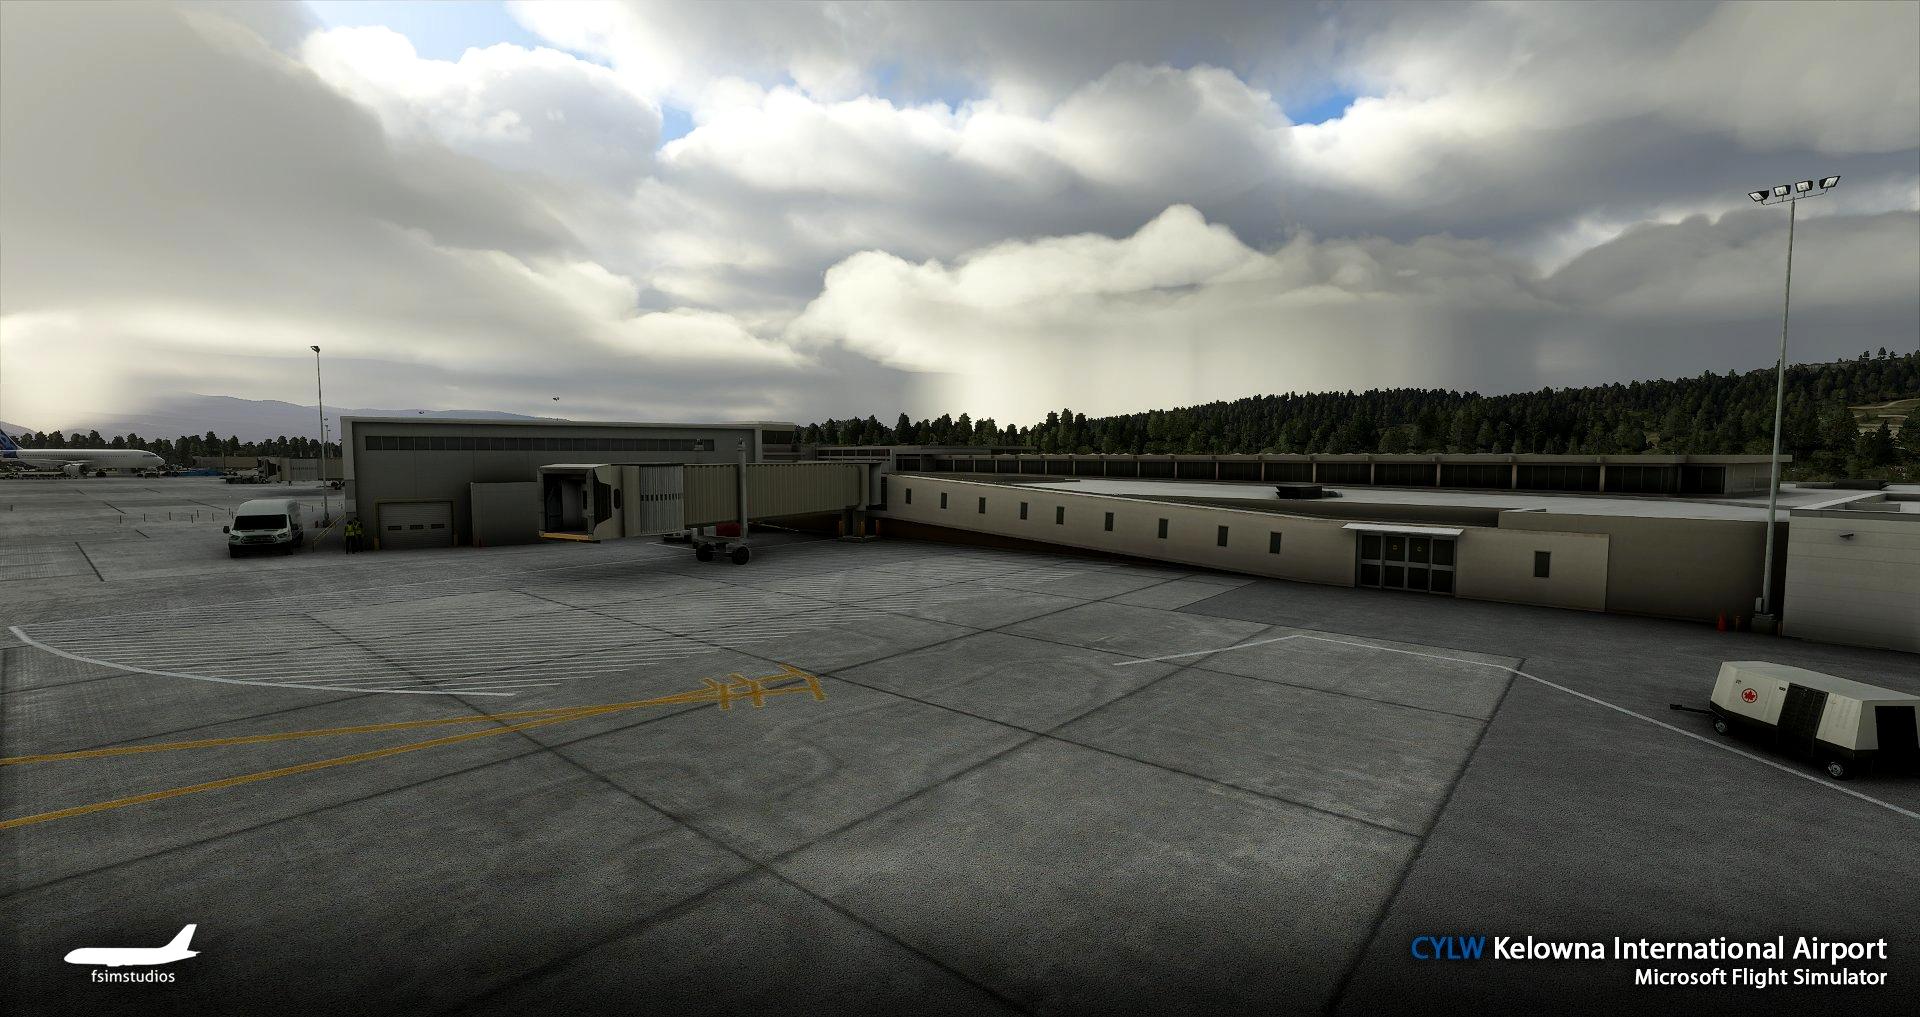 Kelowna International Airport CYLW